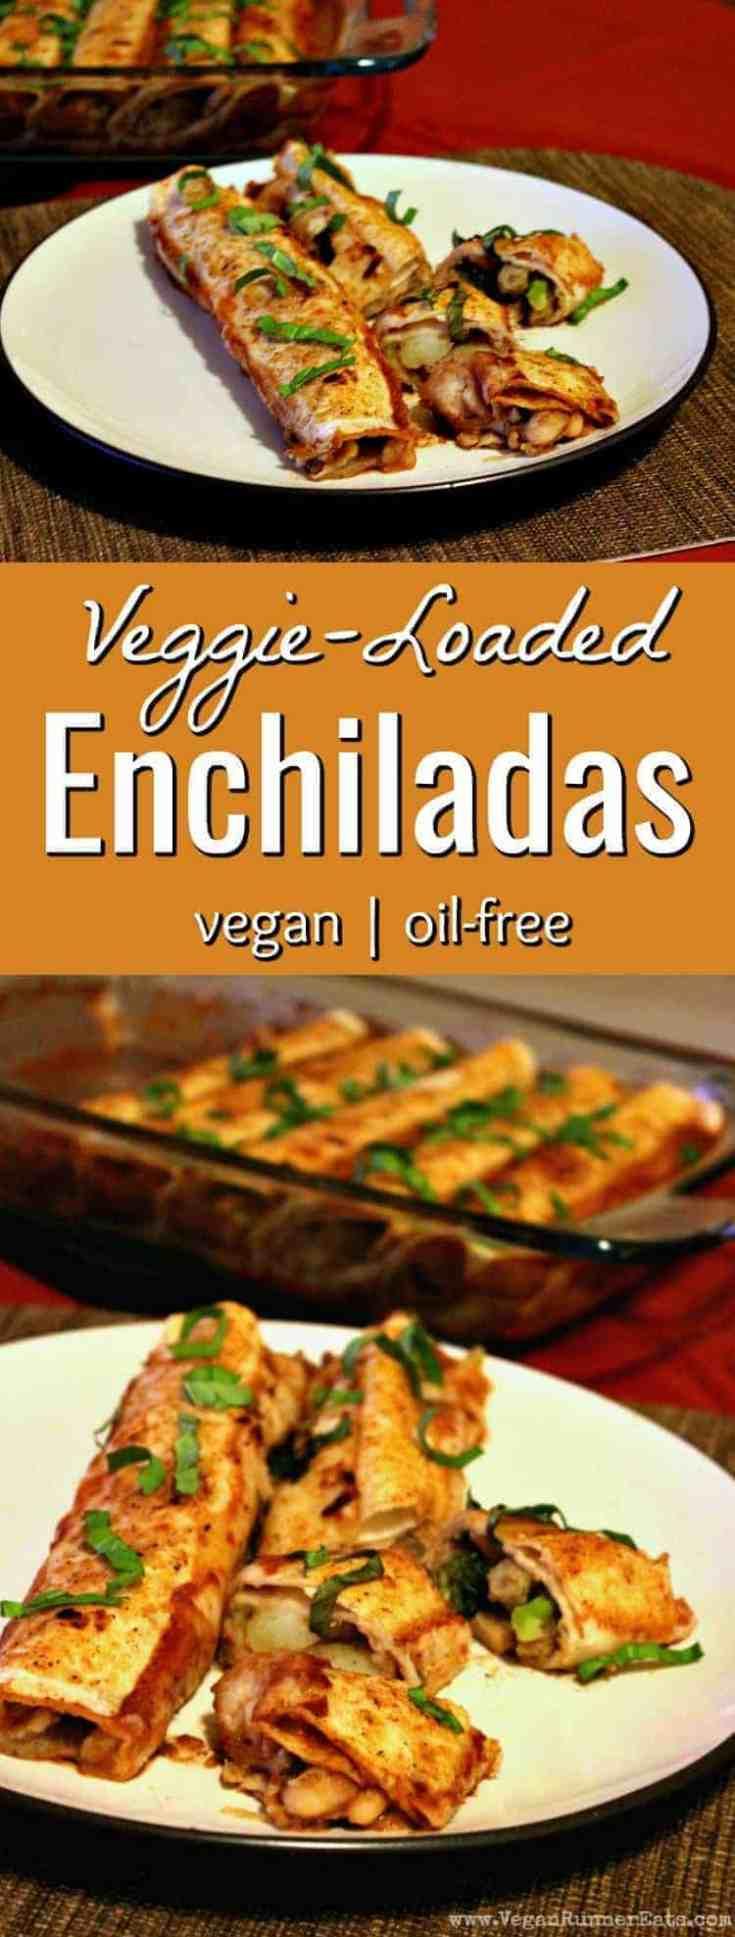 Easy veggie-loaded vegan enchiladas recipe - plant-based, vegan, oil-free enchiladas recipe that will please both vegans and omnivores! vegan enchilada recipe | oil-free enchiladas recipe | plant-based enchiladas recipe | vegetarian enchiladas | meatless enchiladas recipe | vegan Mexican recipes | #veganenchiladas #veganenchiladarecipe #vegetarianenchiladas #veganmaincourse #veganrecipes #veganrecipeshealthy #healthyrecipes #potatorecipes #veganmexican